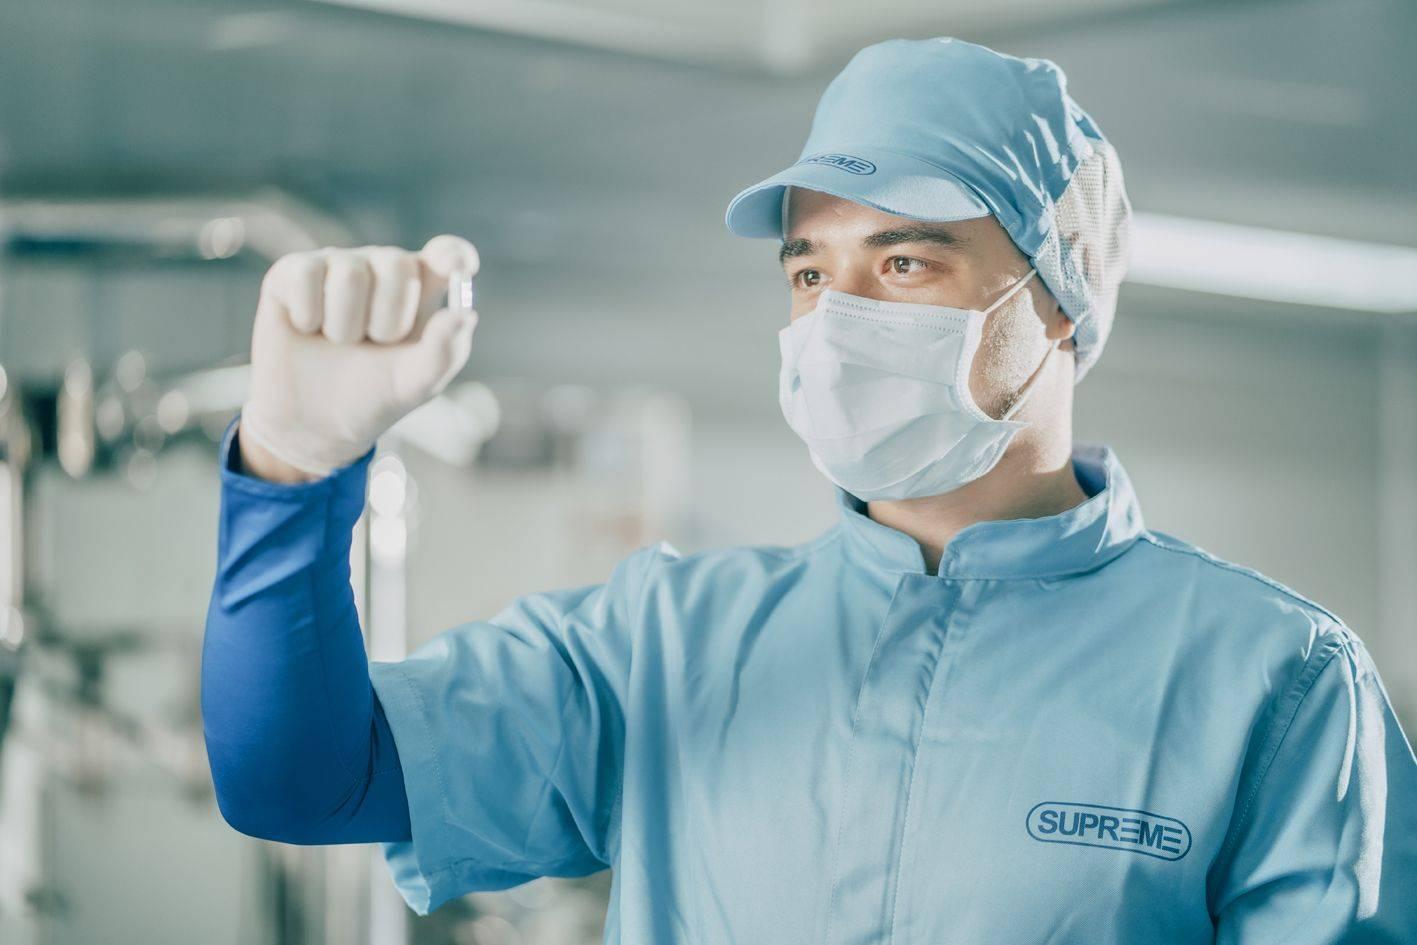 Революция в индустрии биологически активных добавок